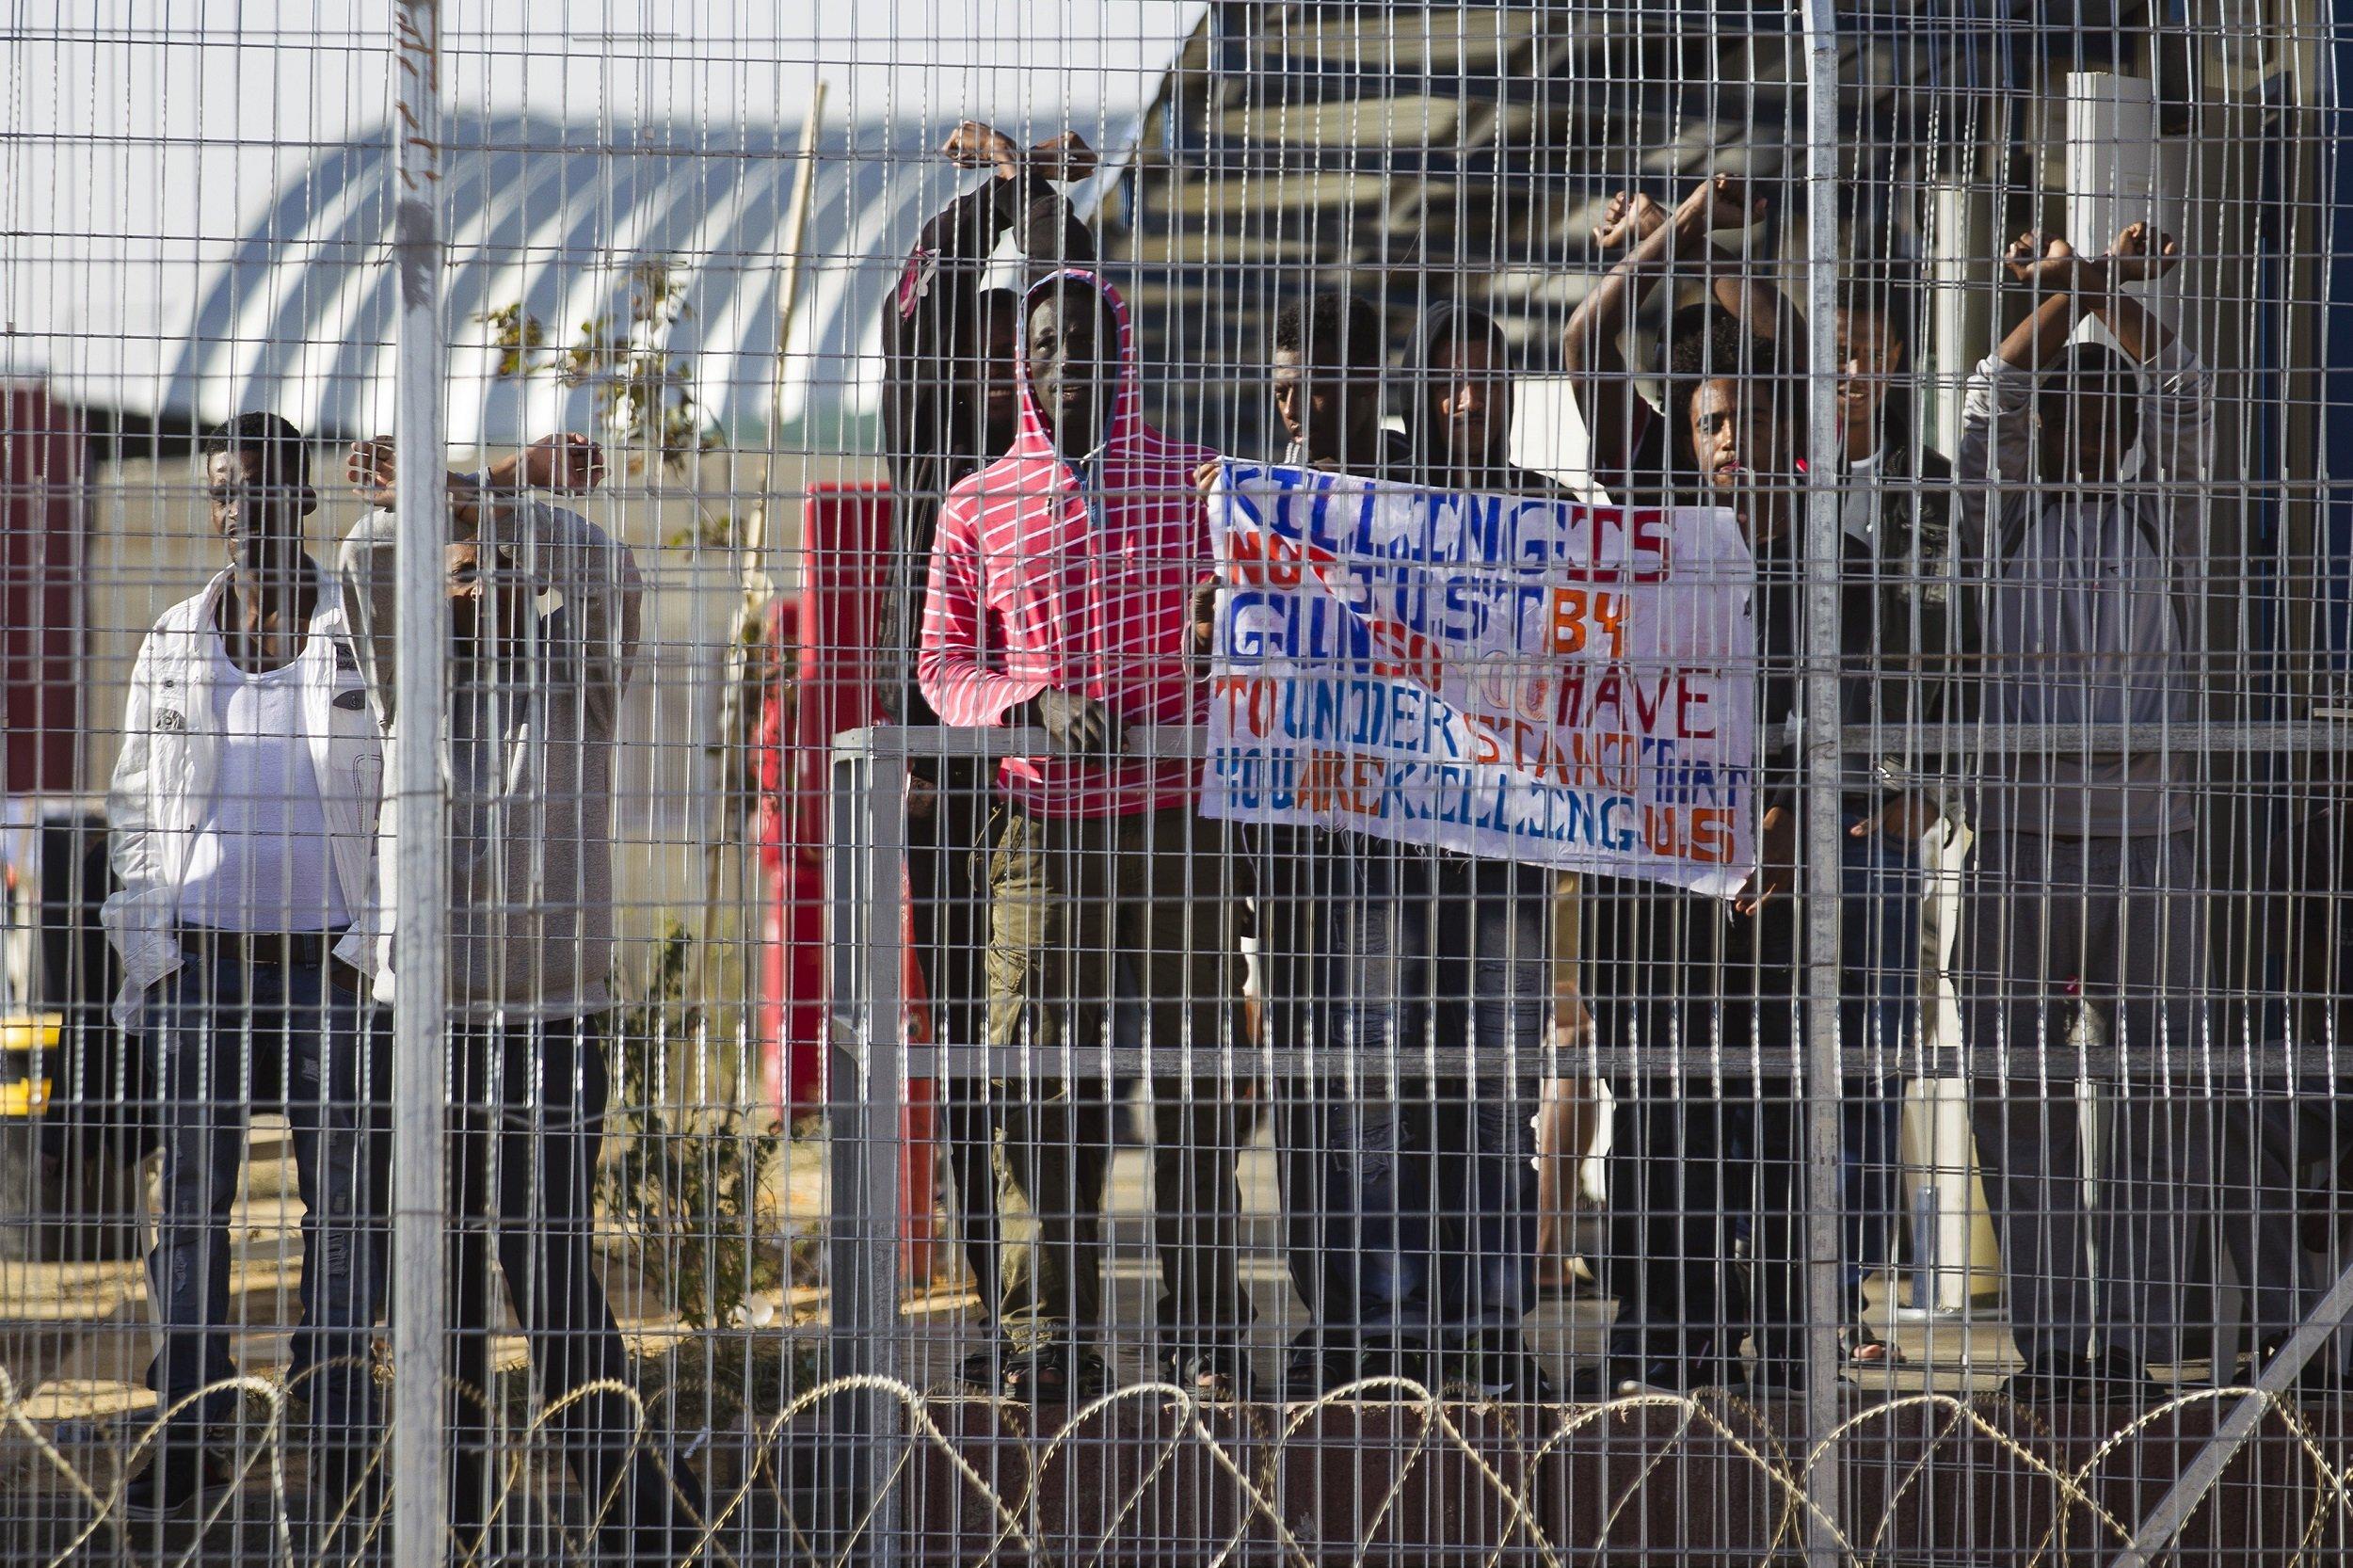 Holot detention center Israel